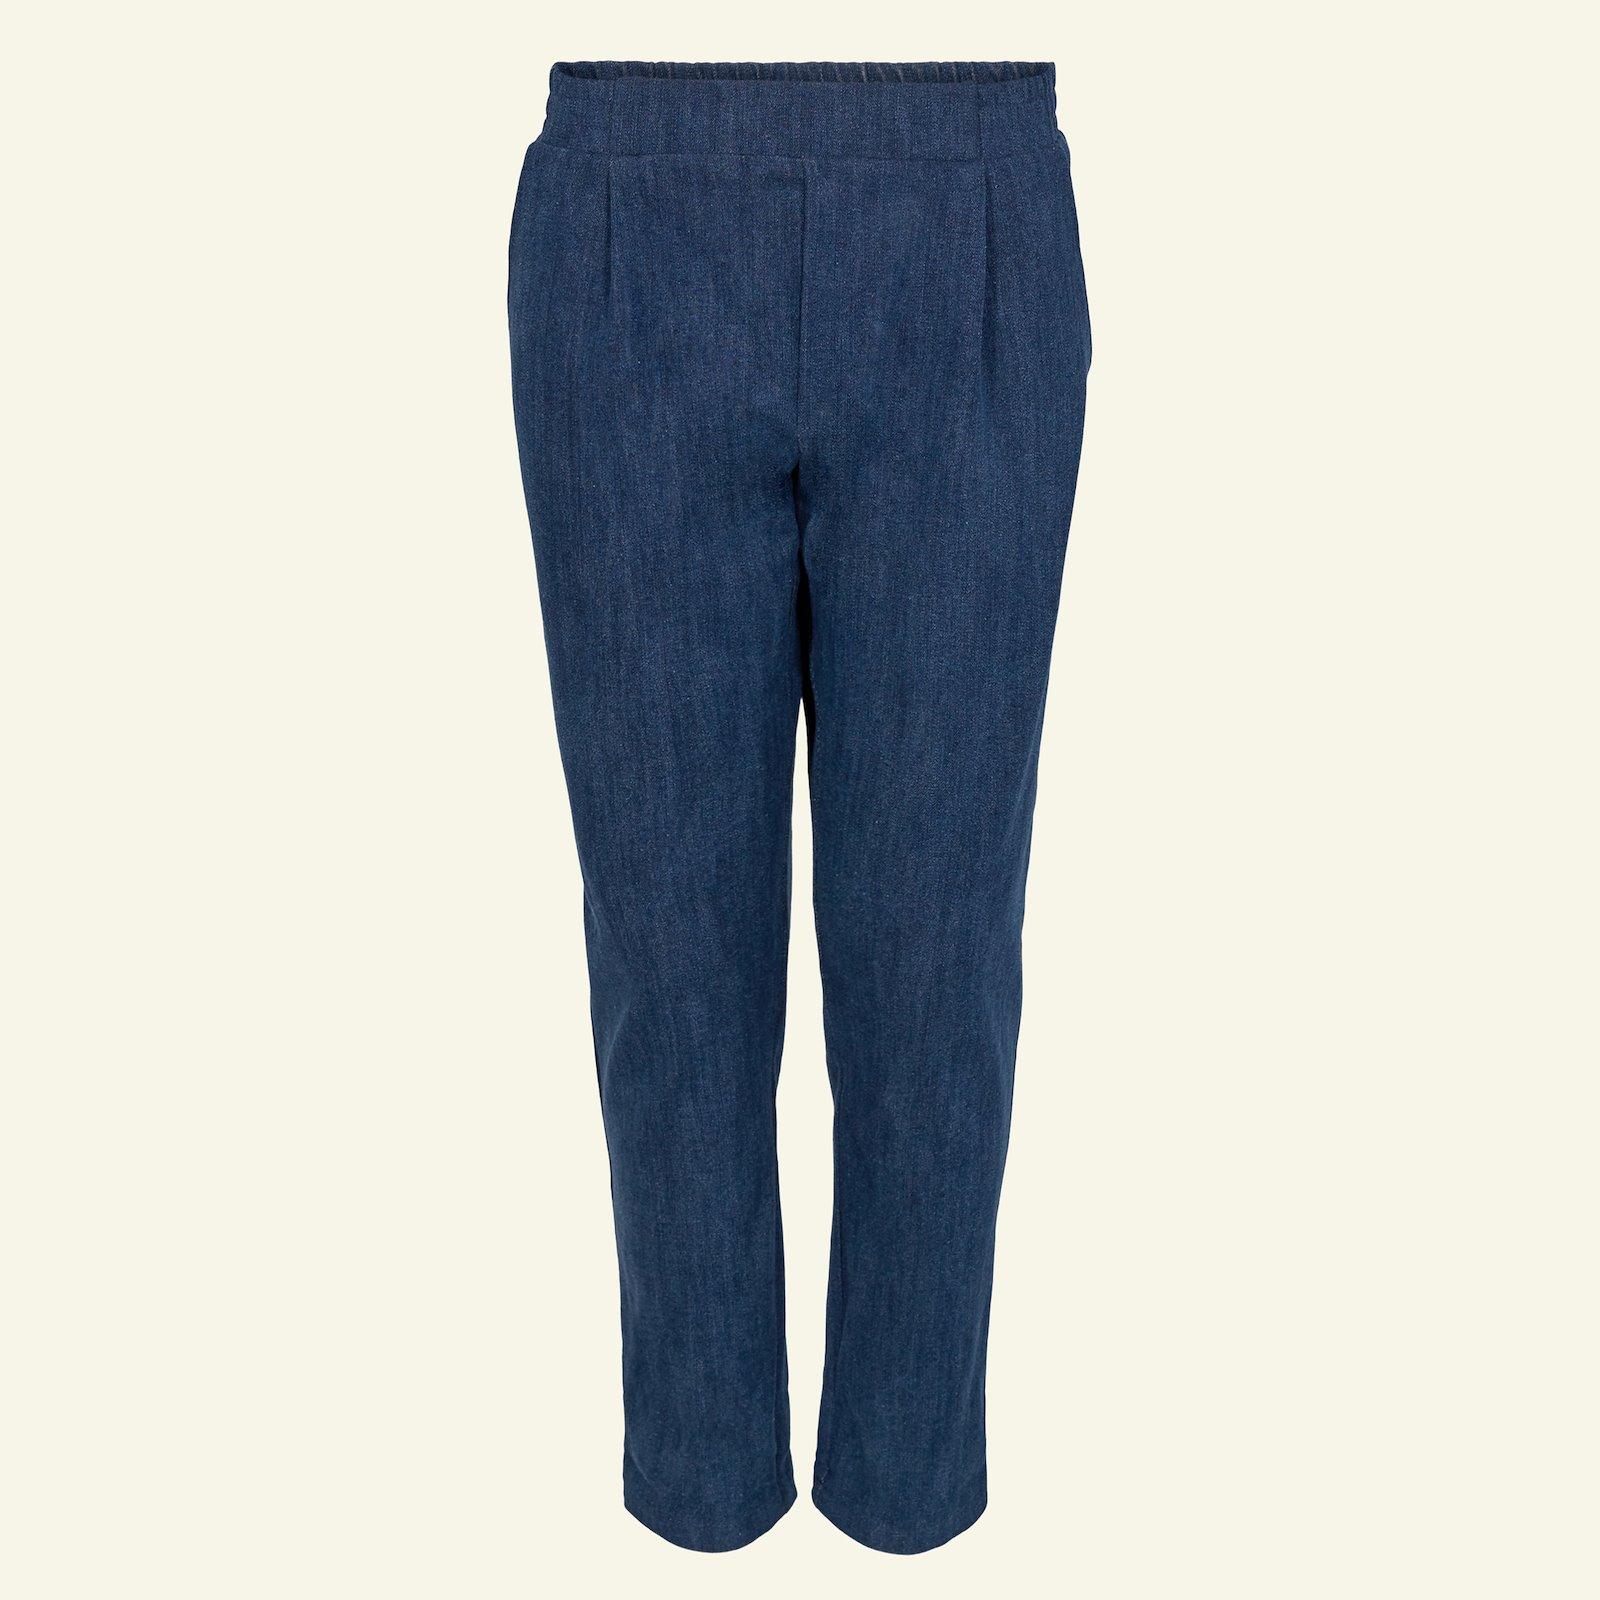 Chino pants, 134/9y p60033_460851_sskit